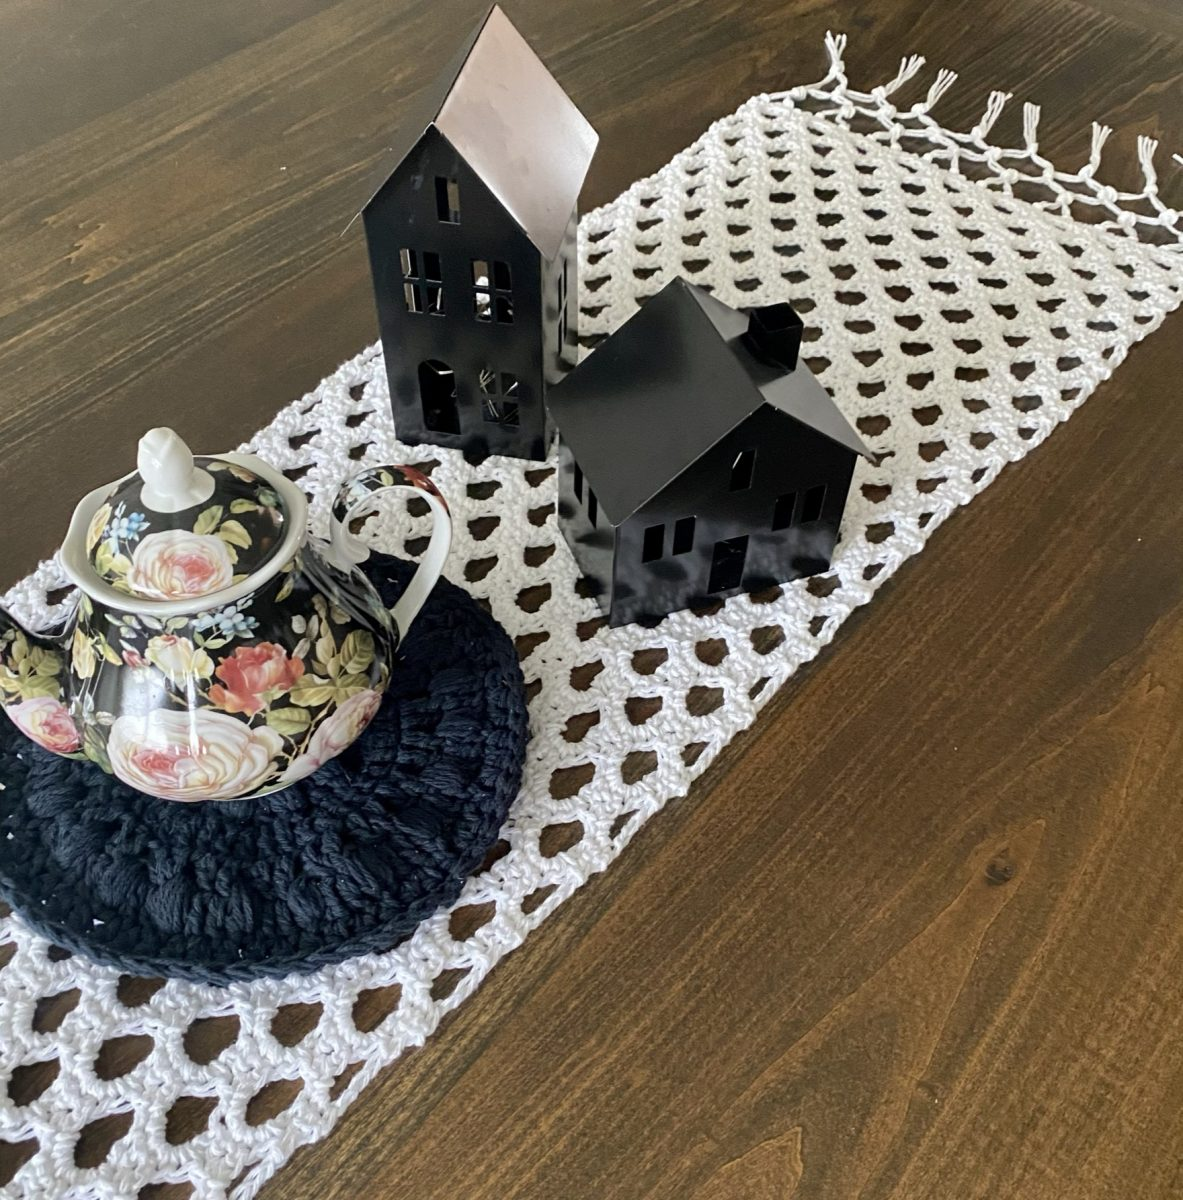 Honeycomb Table Runner crochet pattern by Little Monkeys Designs – easy crochet pattern